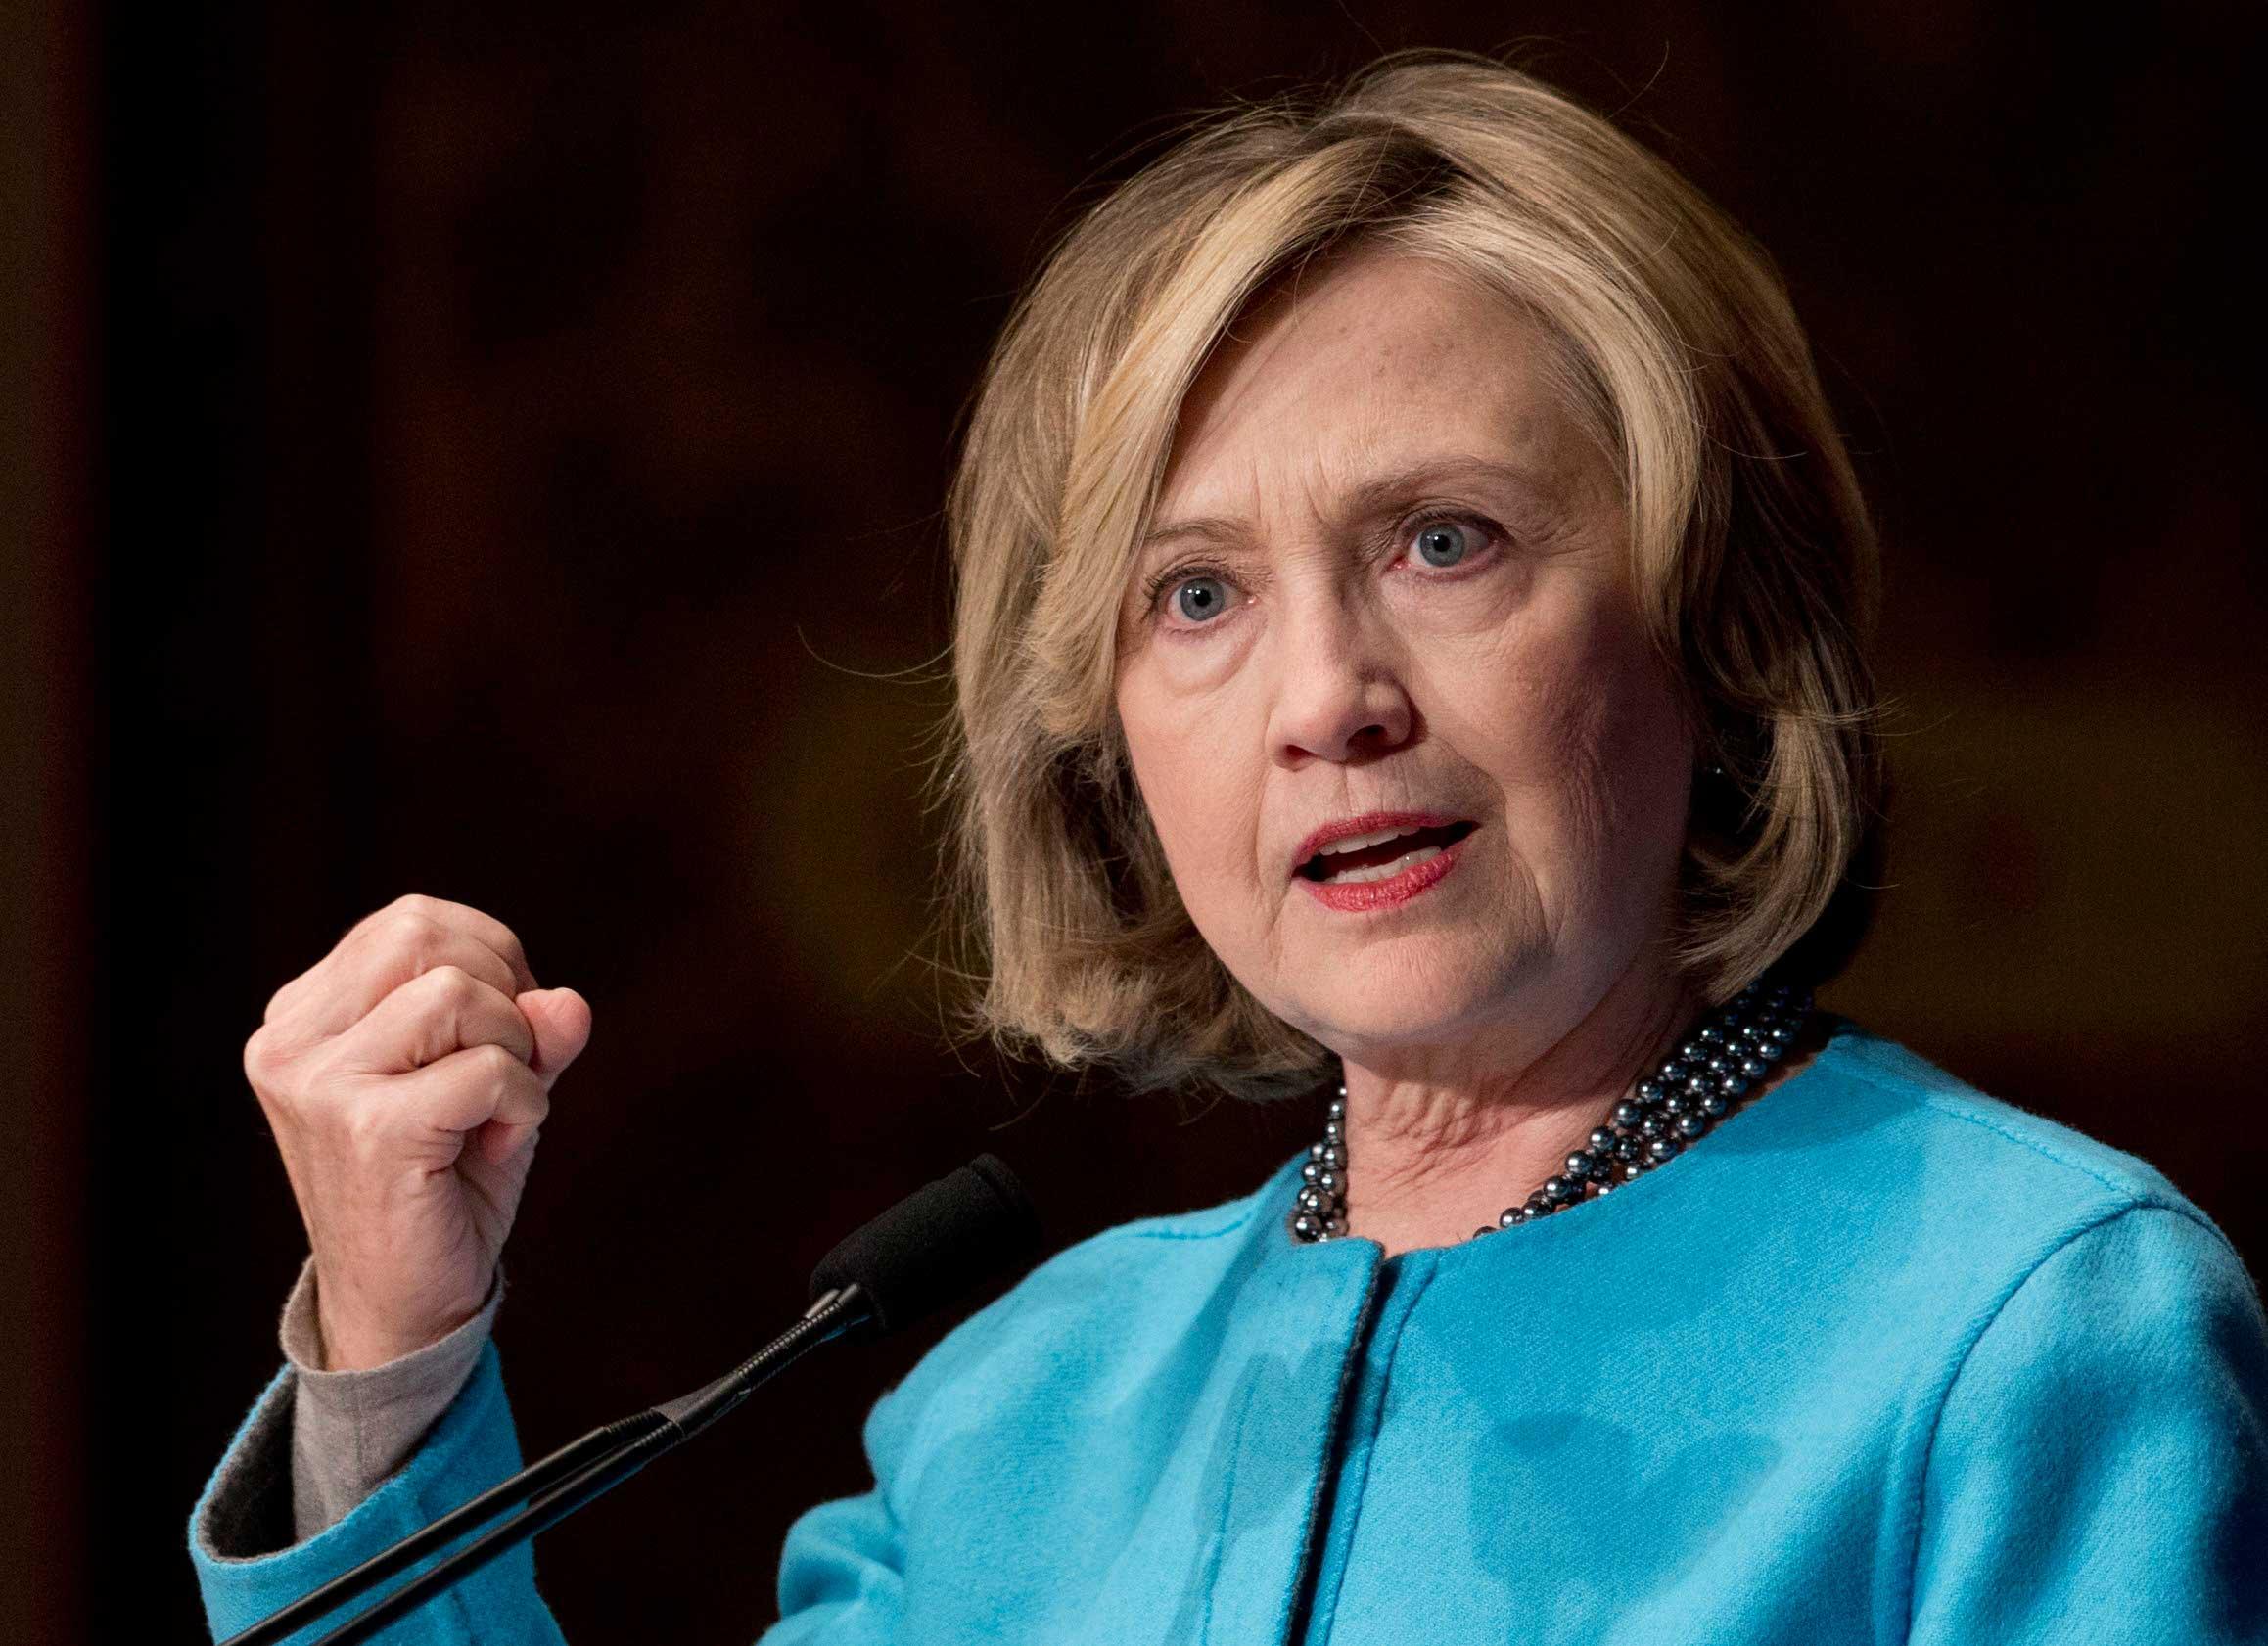 Former Secretary of State Hillary Rodham Clinton speaks in Gaston Hall at Georgetown University in Washington on Dec. 3, 2014.